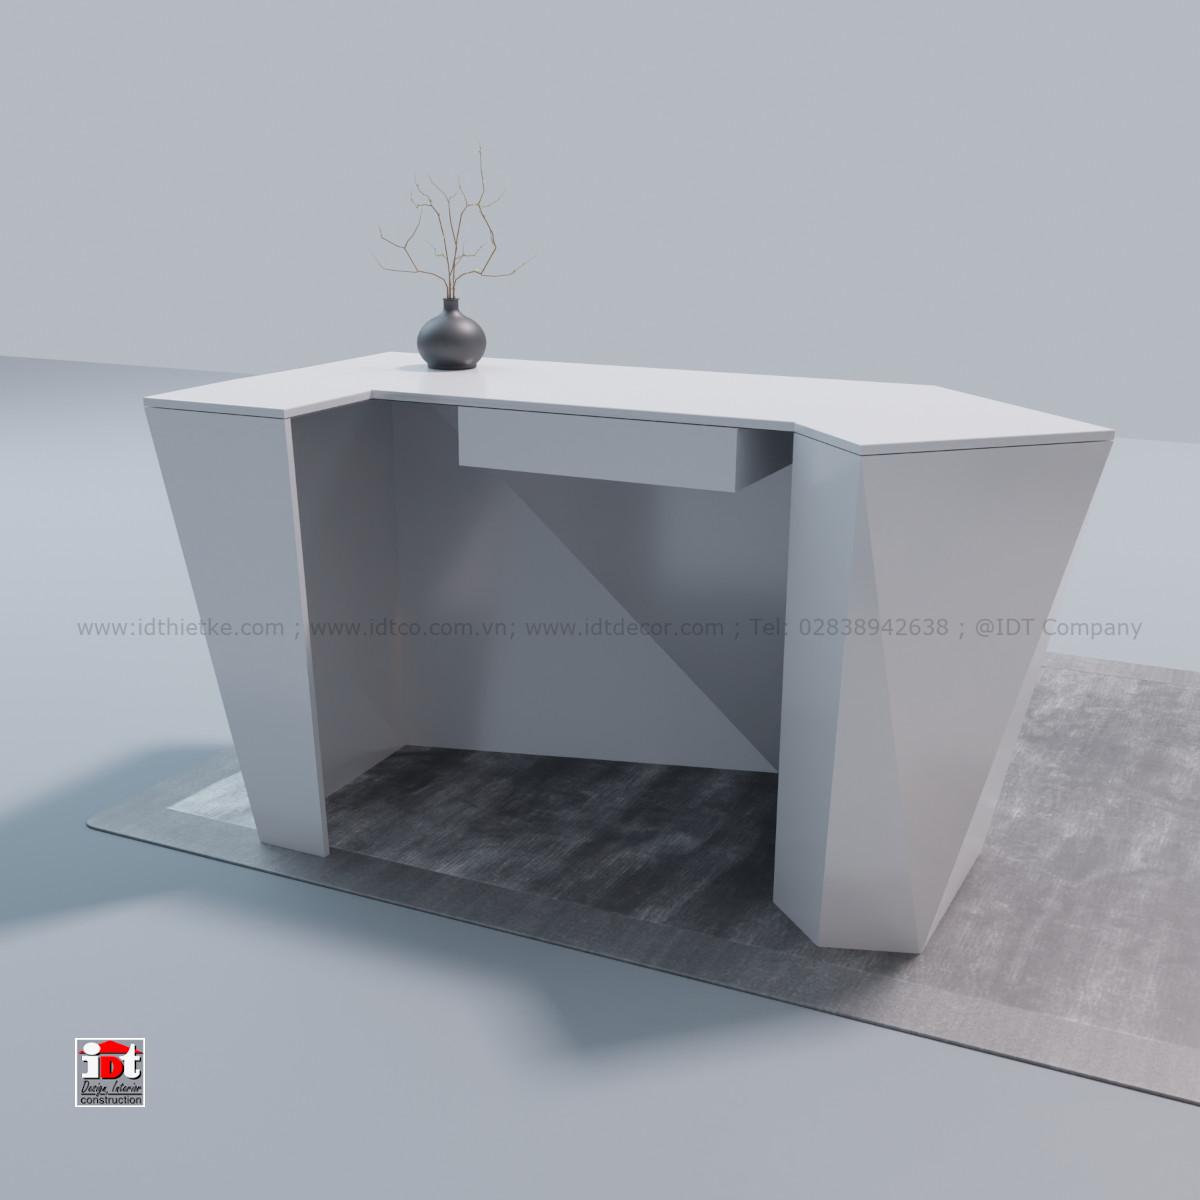 Luxury modern diamond shaped low reception counter